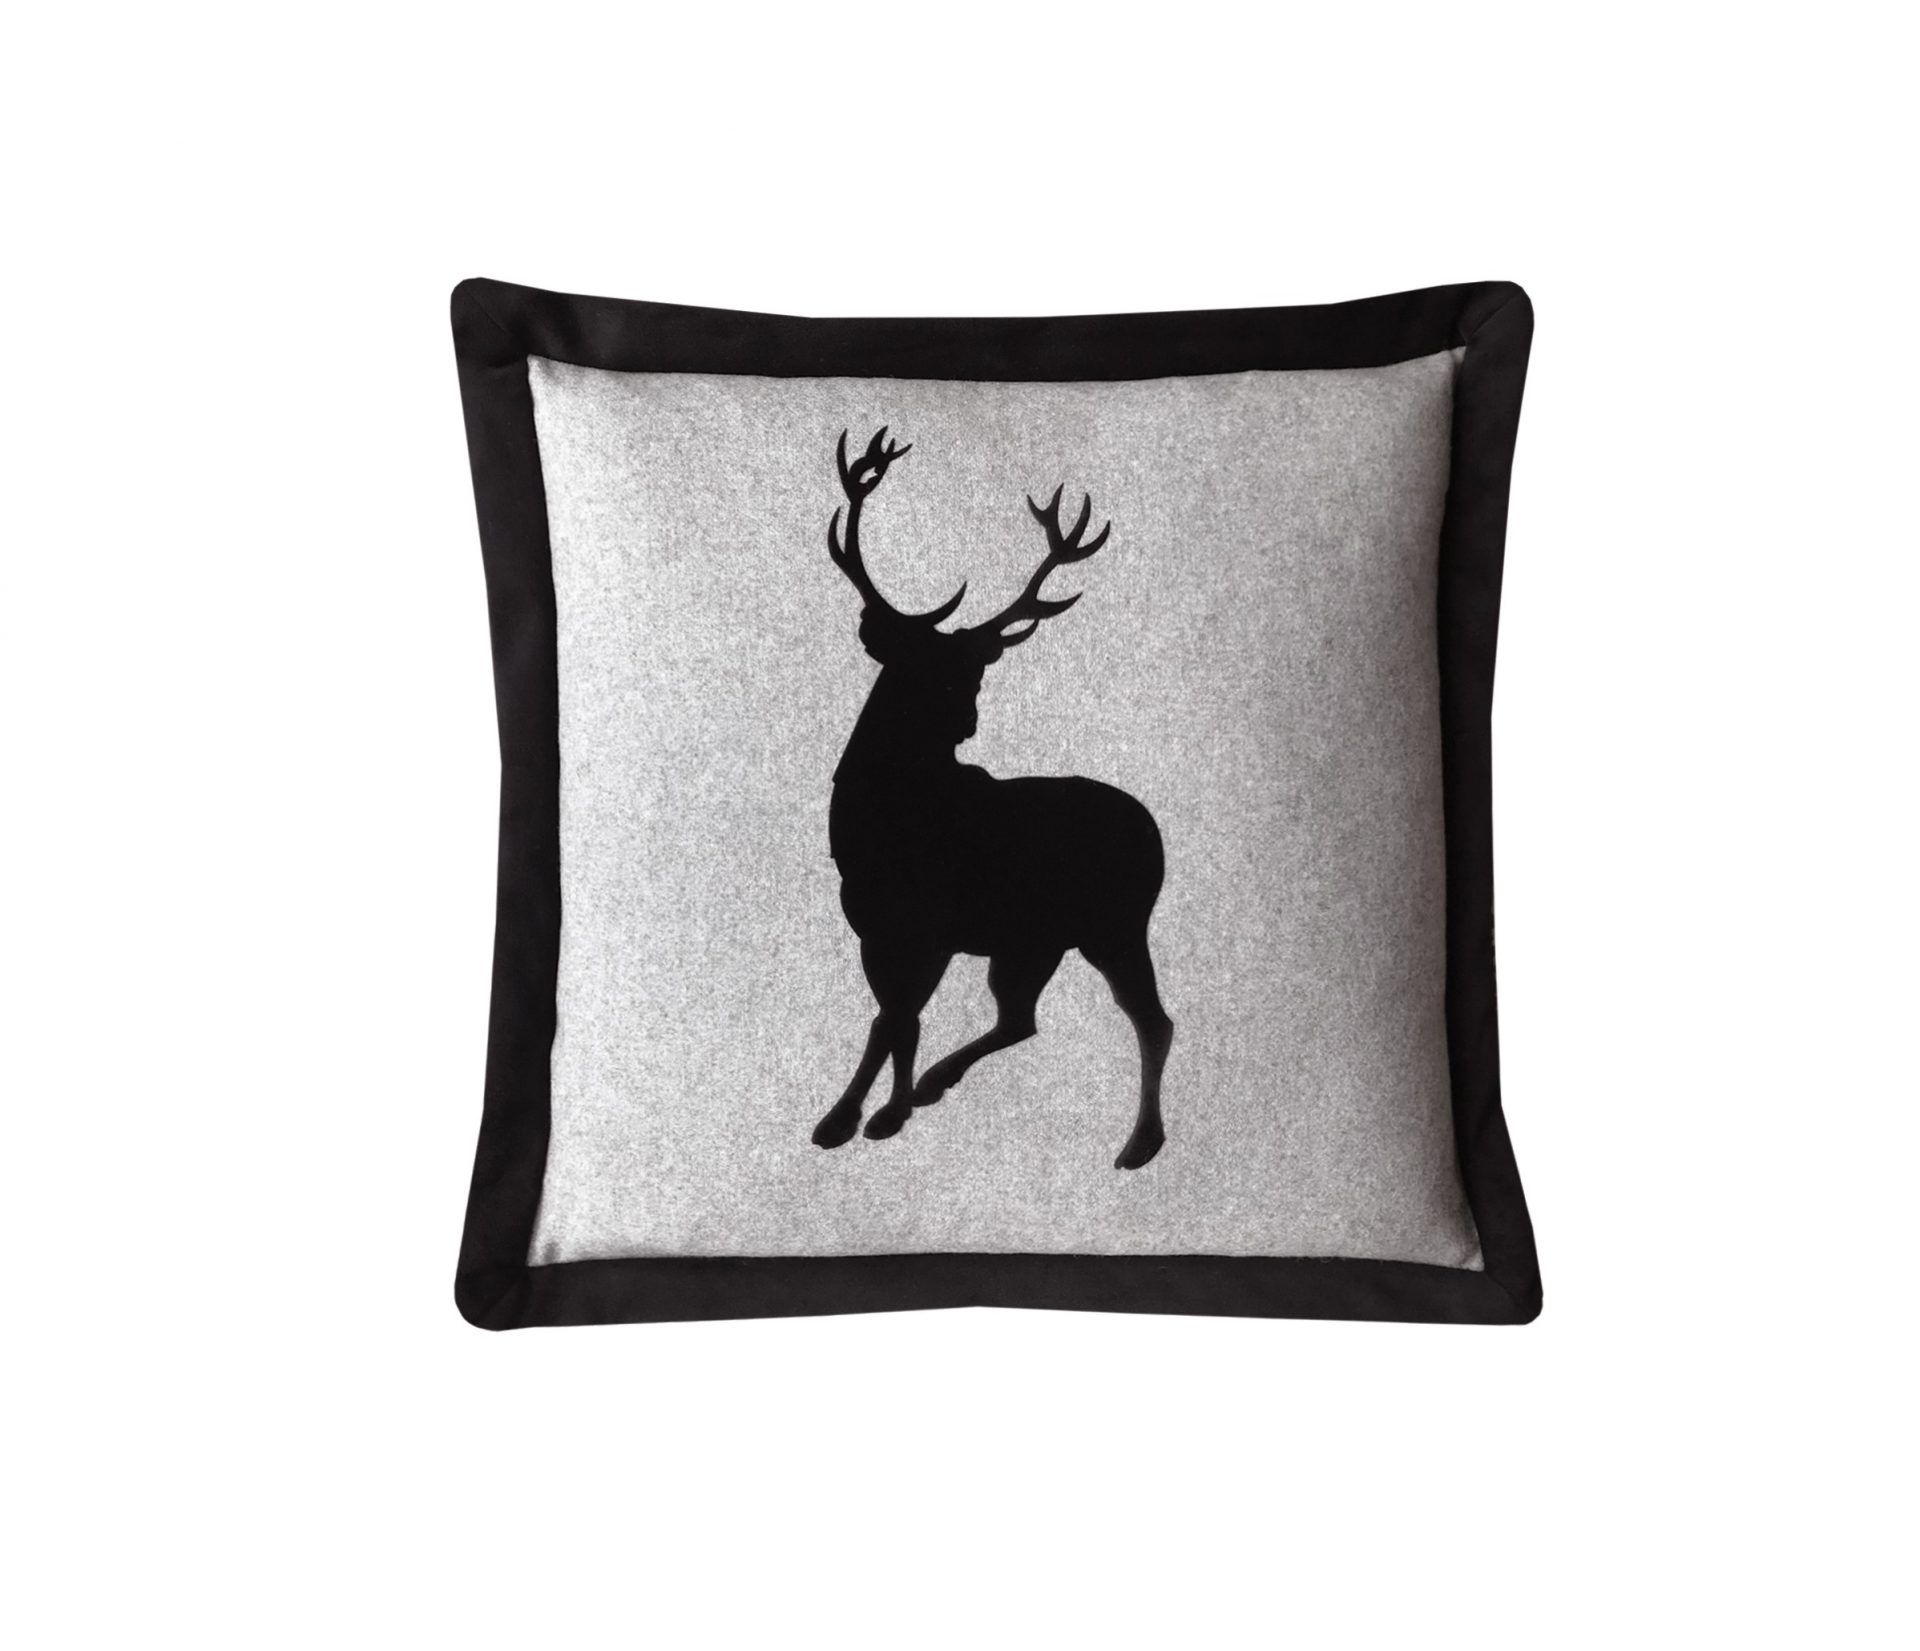 Black applique velvet stag throw pillow.